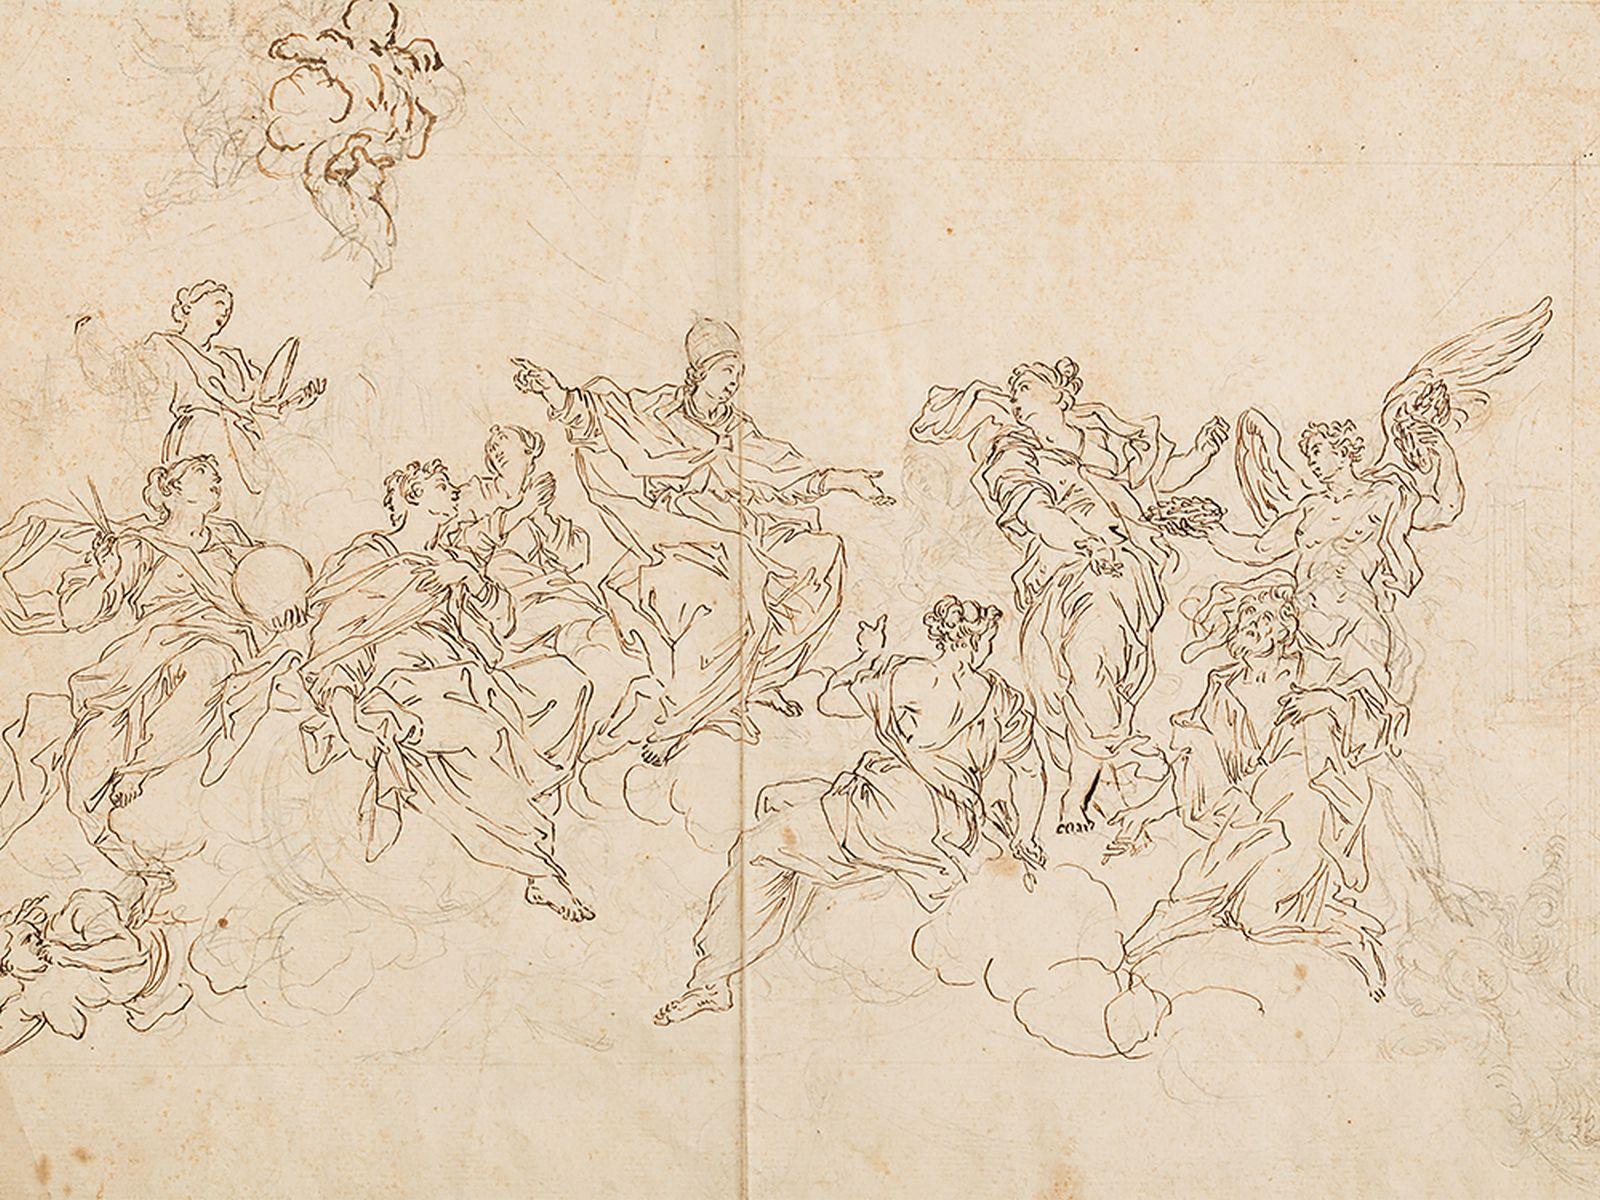 #12 Niccolò Lapi Attr., Allegory of the Papacy, 17th Century  Niccolò Lapi Zugeschr., Allegorie auf das Papsttums, 17. Jh. Image